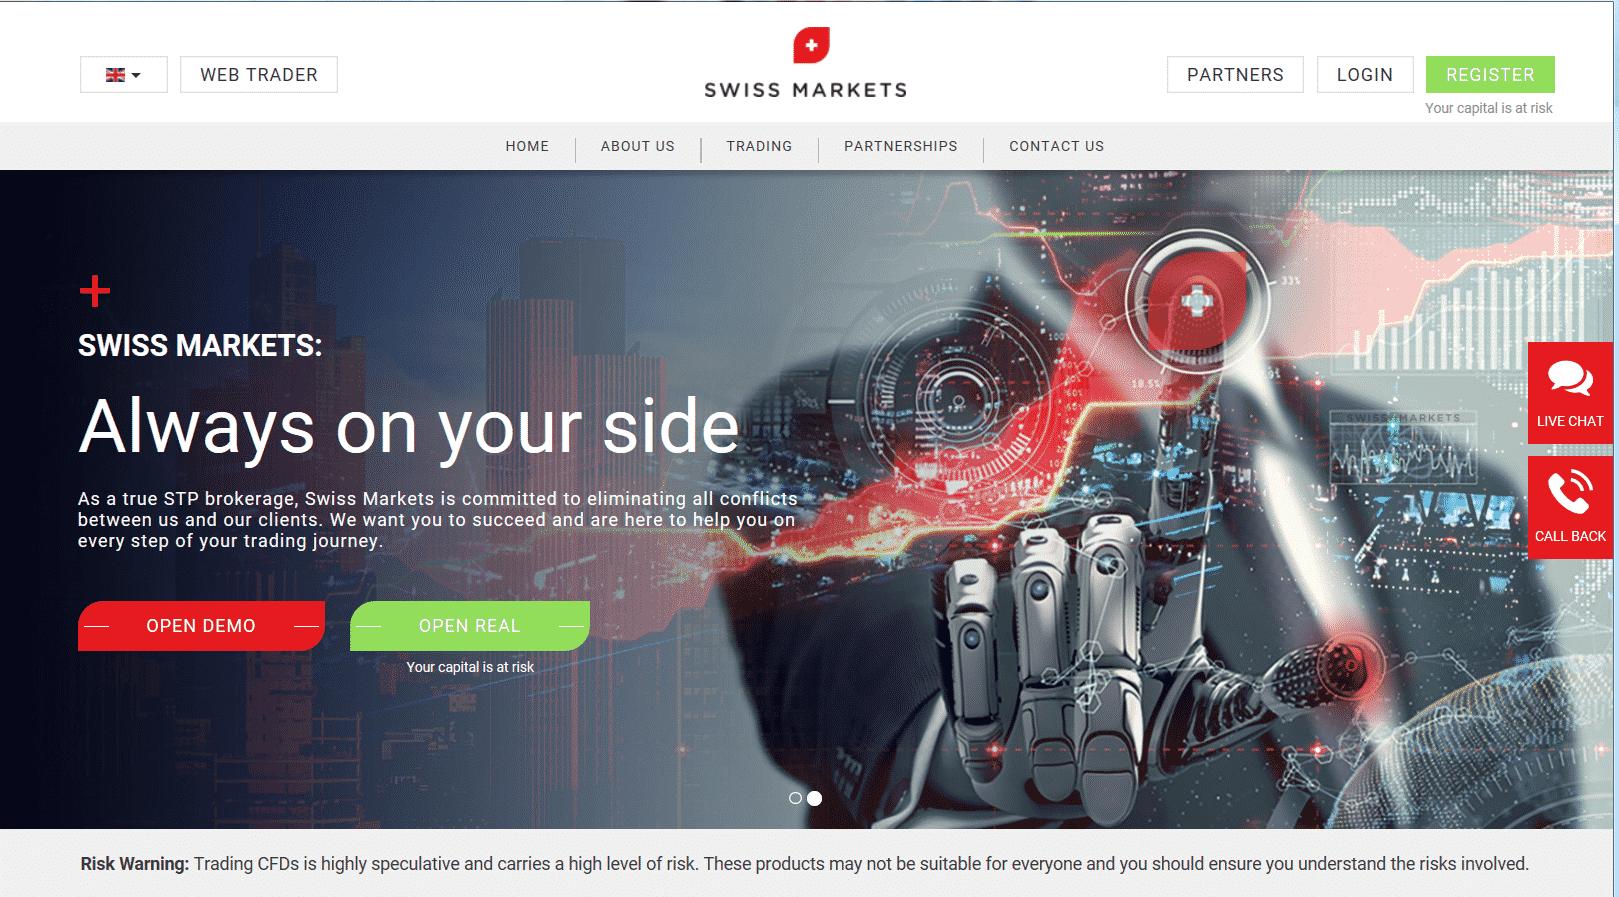 Swiss Markets Website